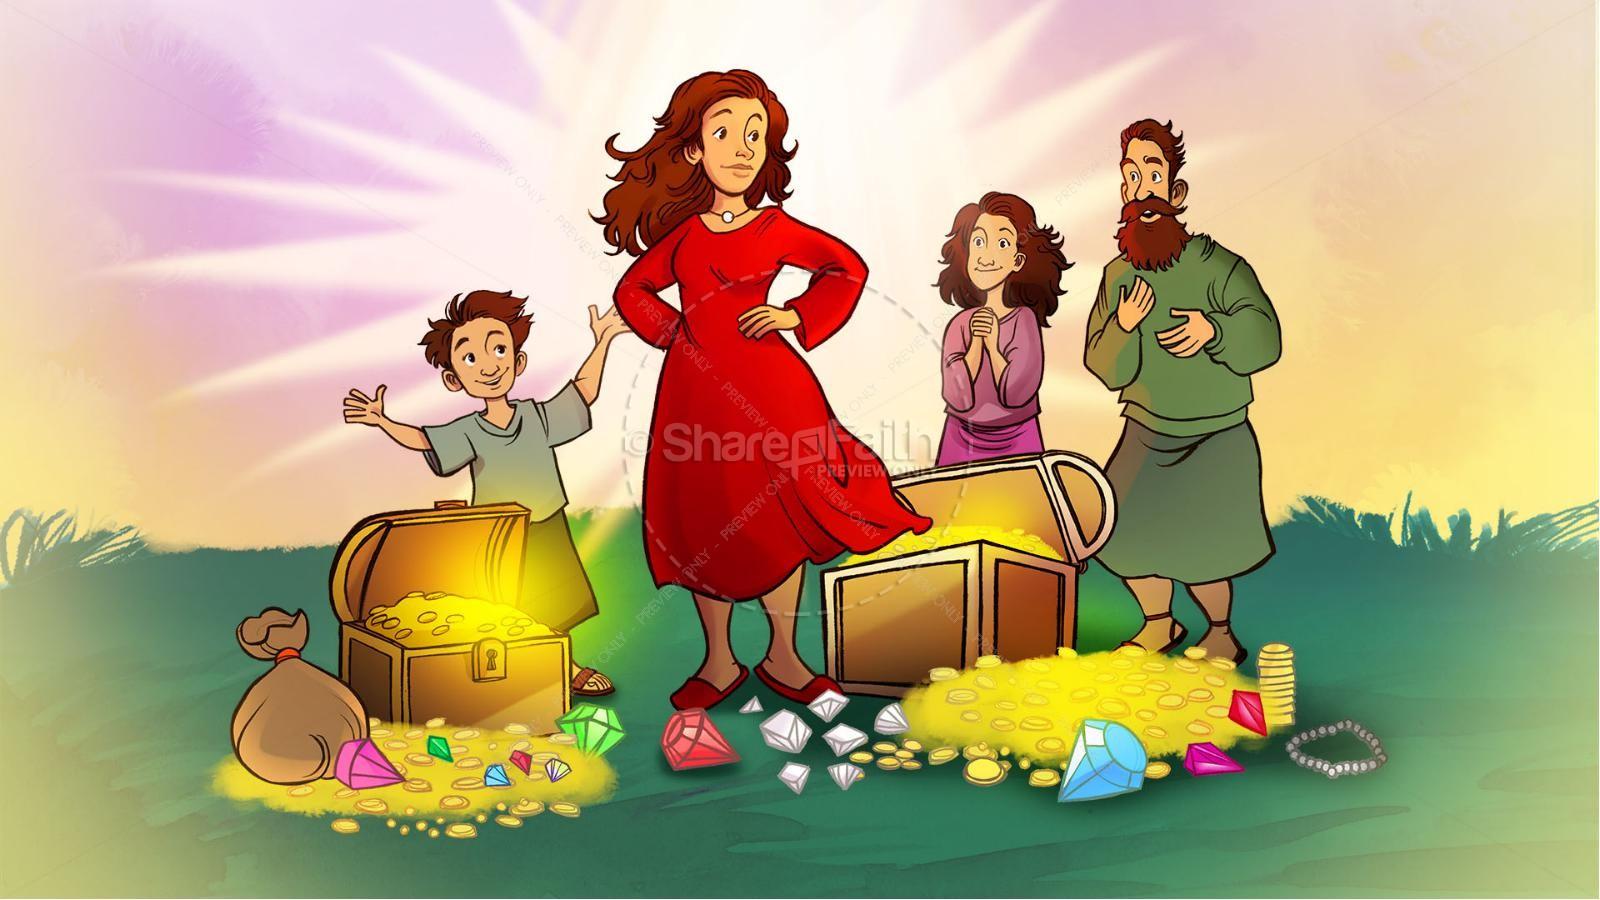 Proverbs 31 A Woman of Faith Kids Bible Story | slide 2